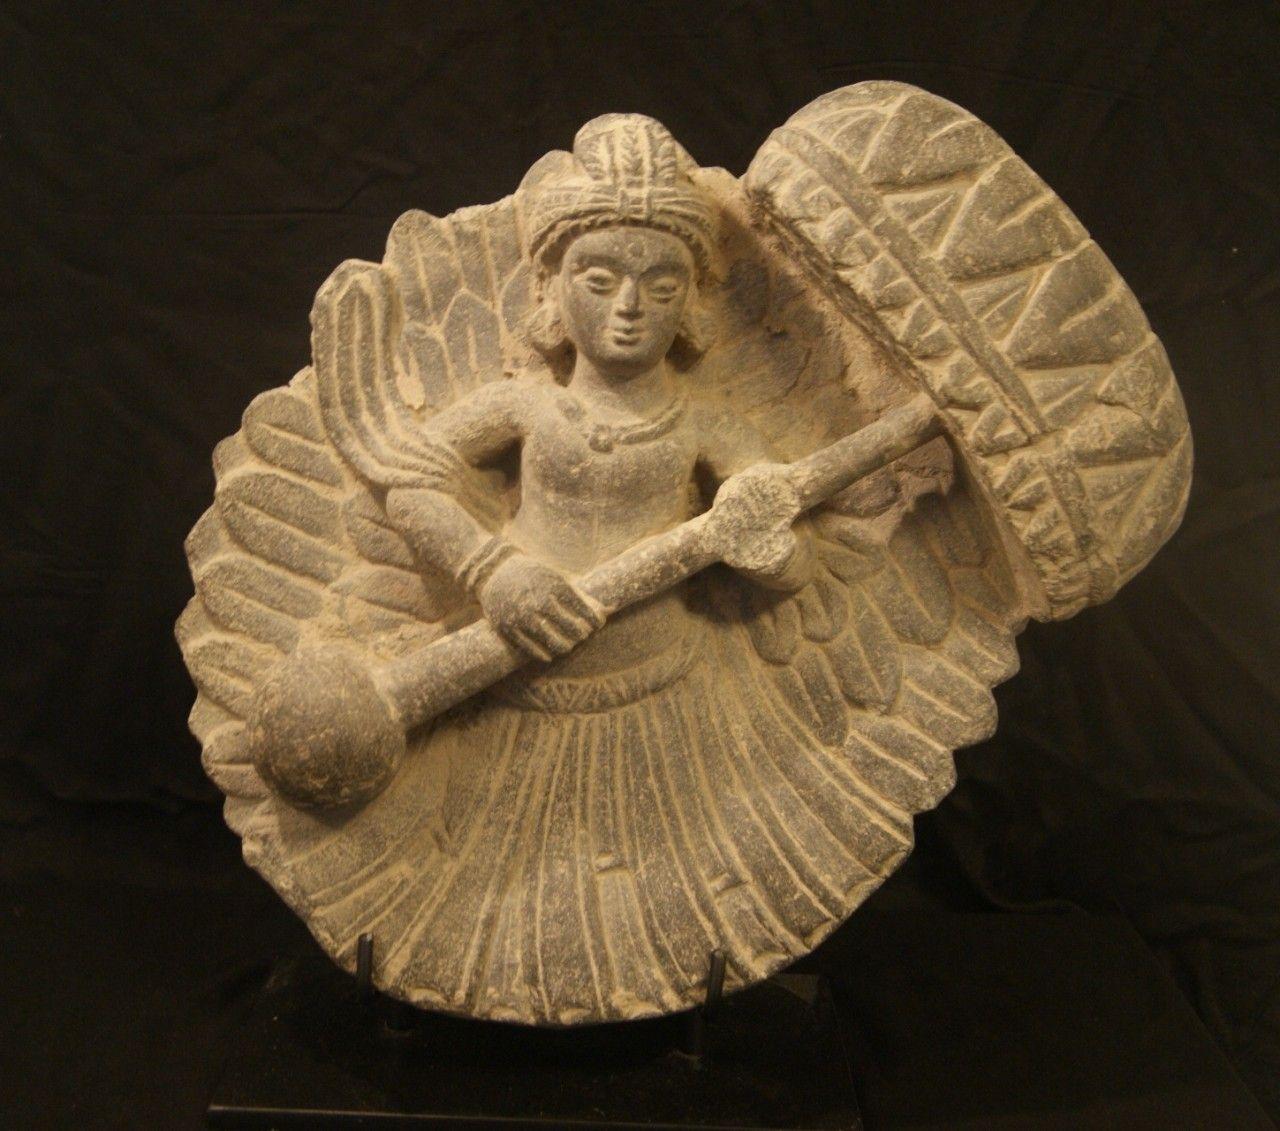 Chatradhara Umbrella Bearer Gandhara Art Celestial